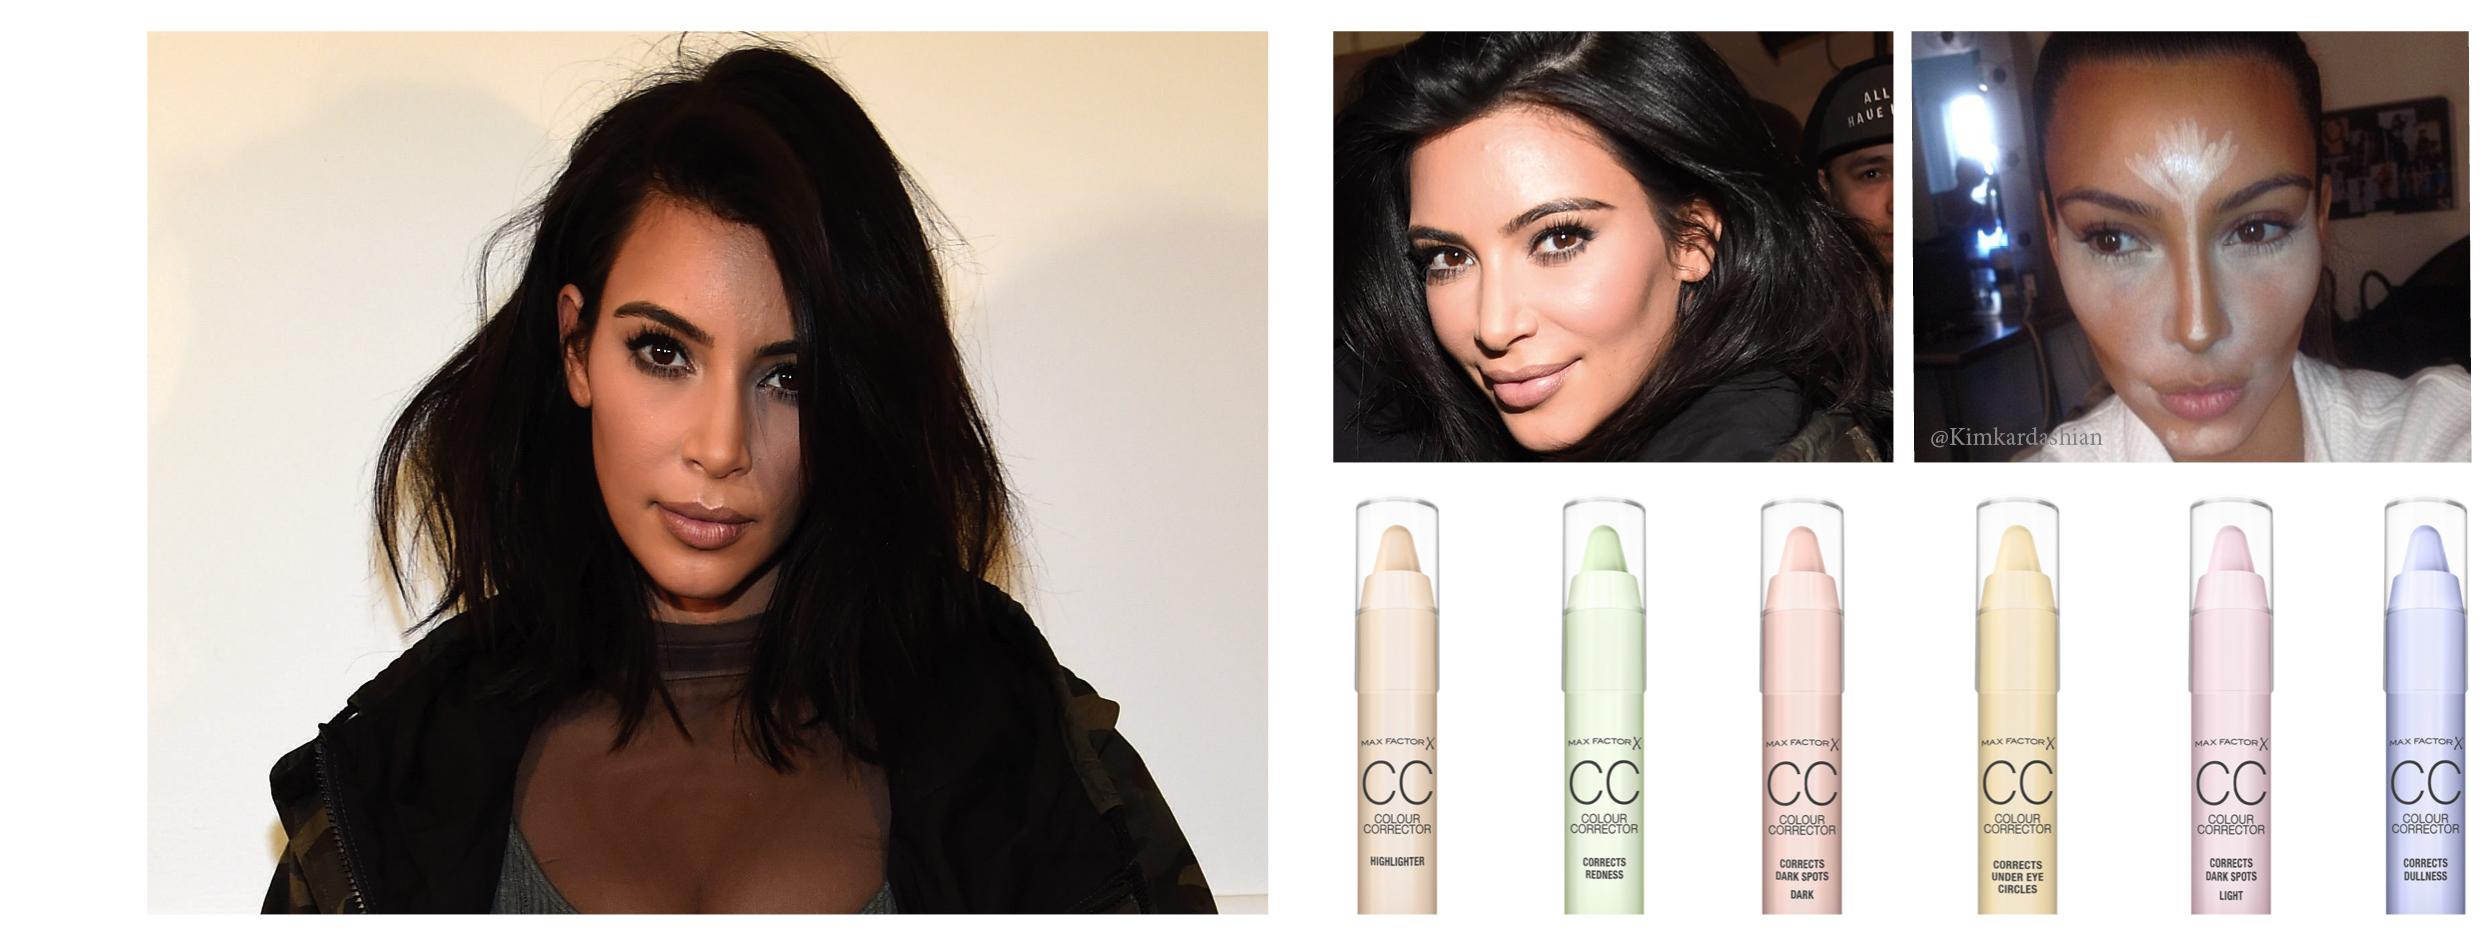 Kardashian Countouring Max Factor